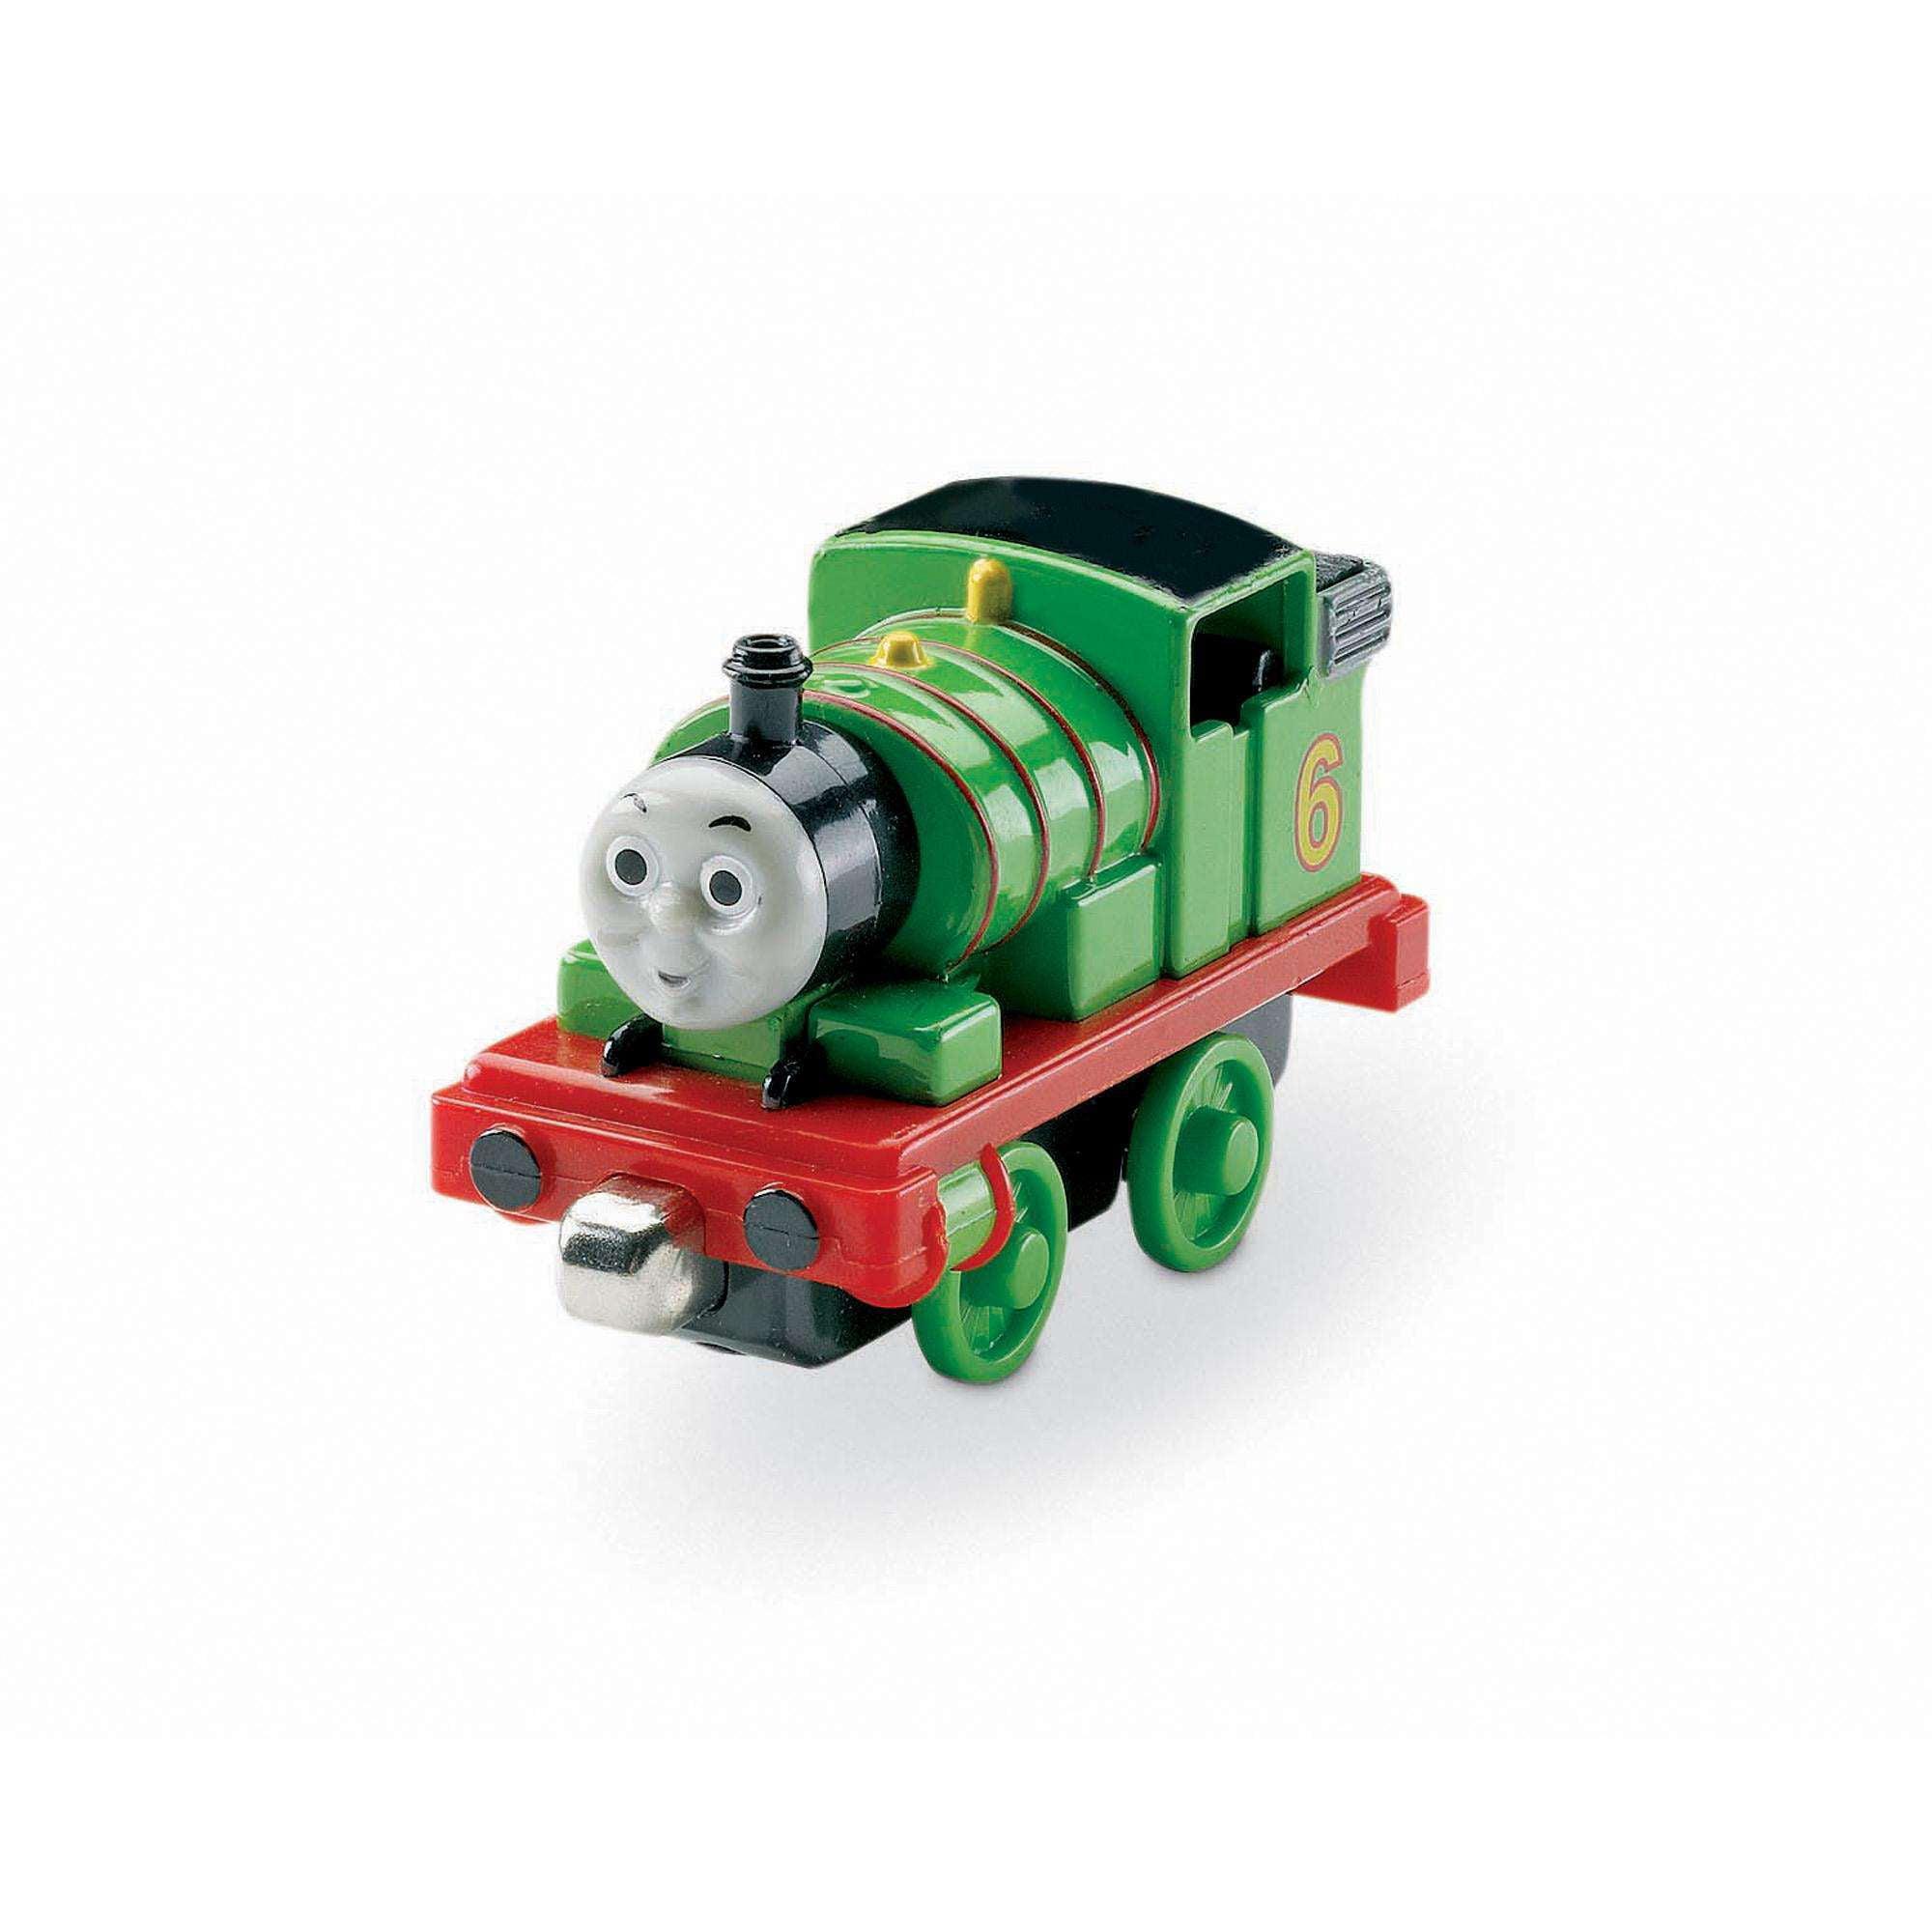 Thomas & Friends Take-n-Play Playset - Percy